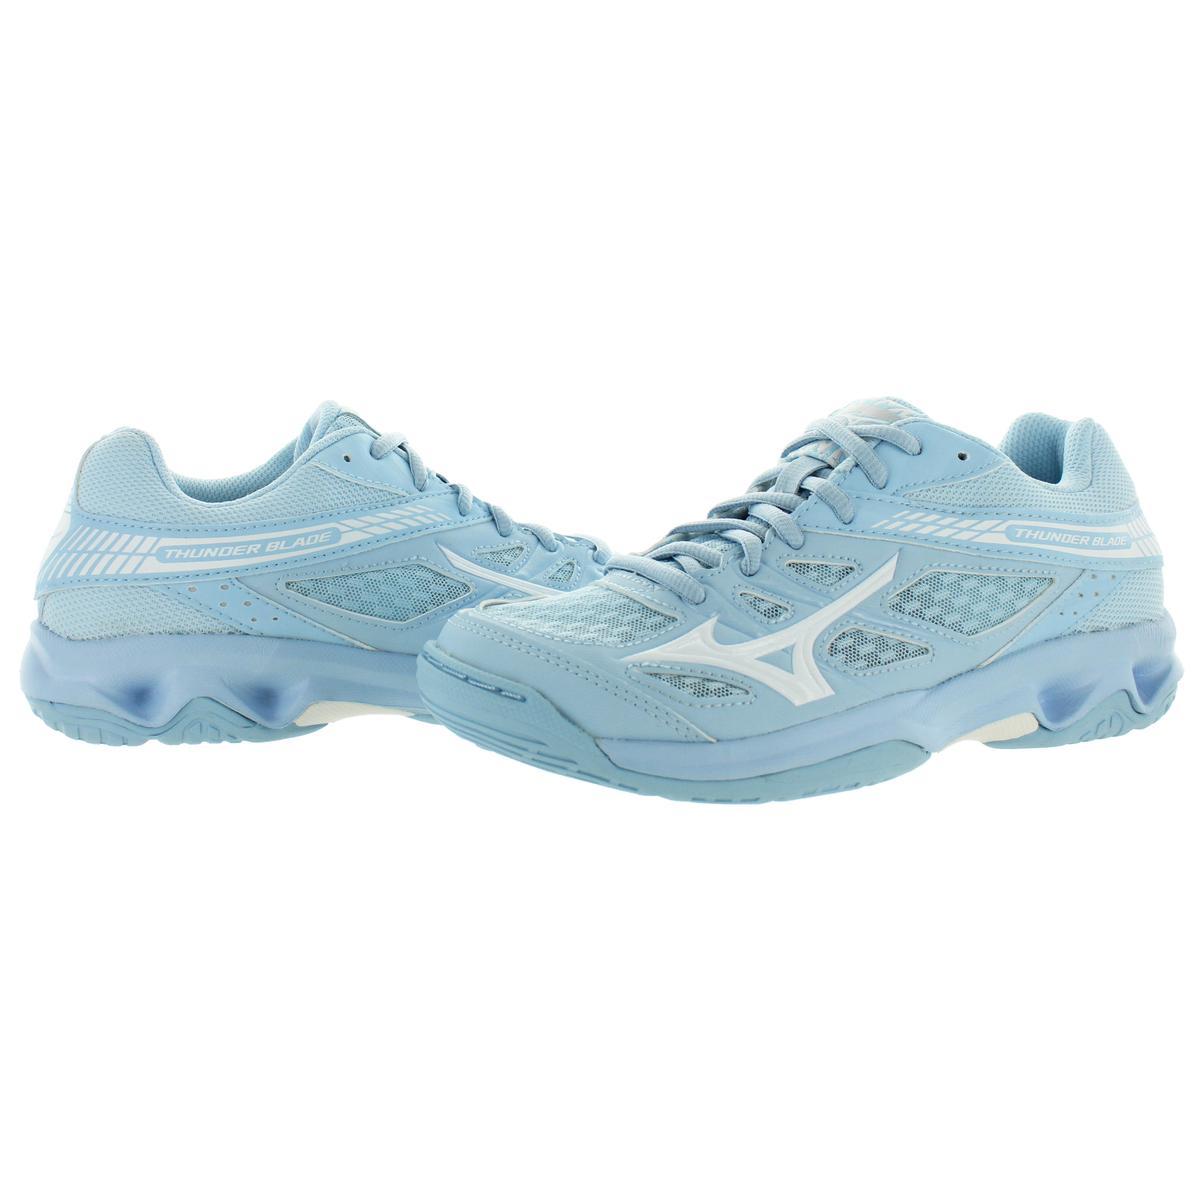 Mizuno-Womens-Thunder-Blade-Low-Top-Non-Marking-Sneakers-Shoes-BHFO-9051 thumbnail 3